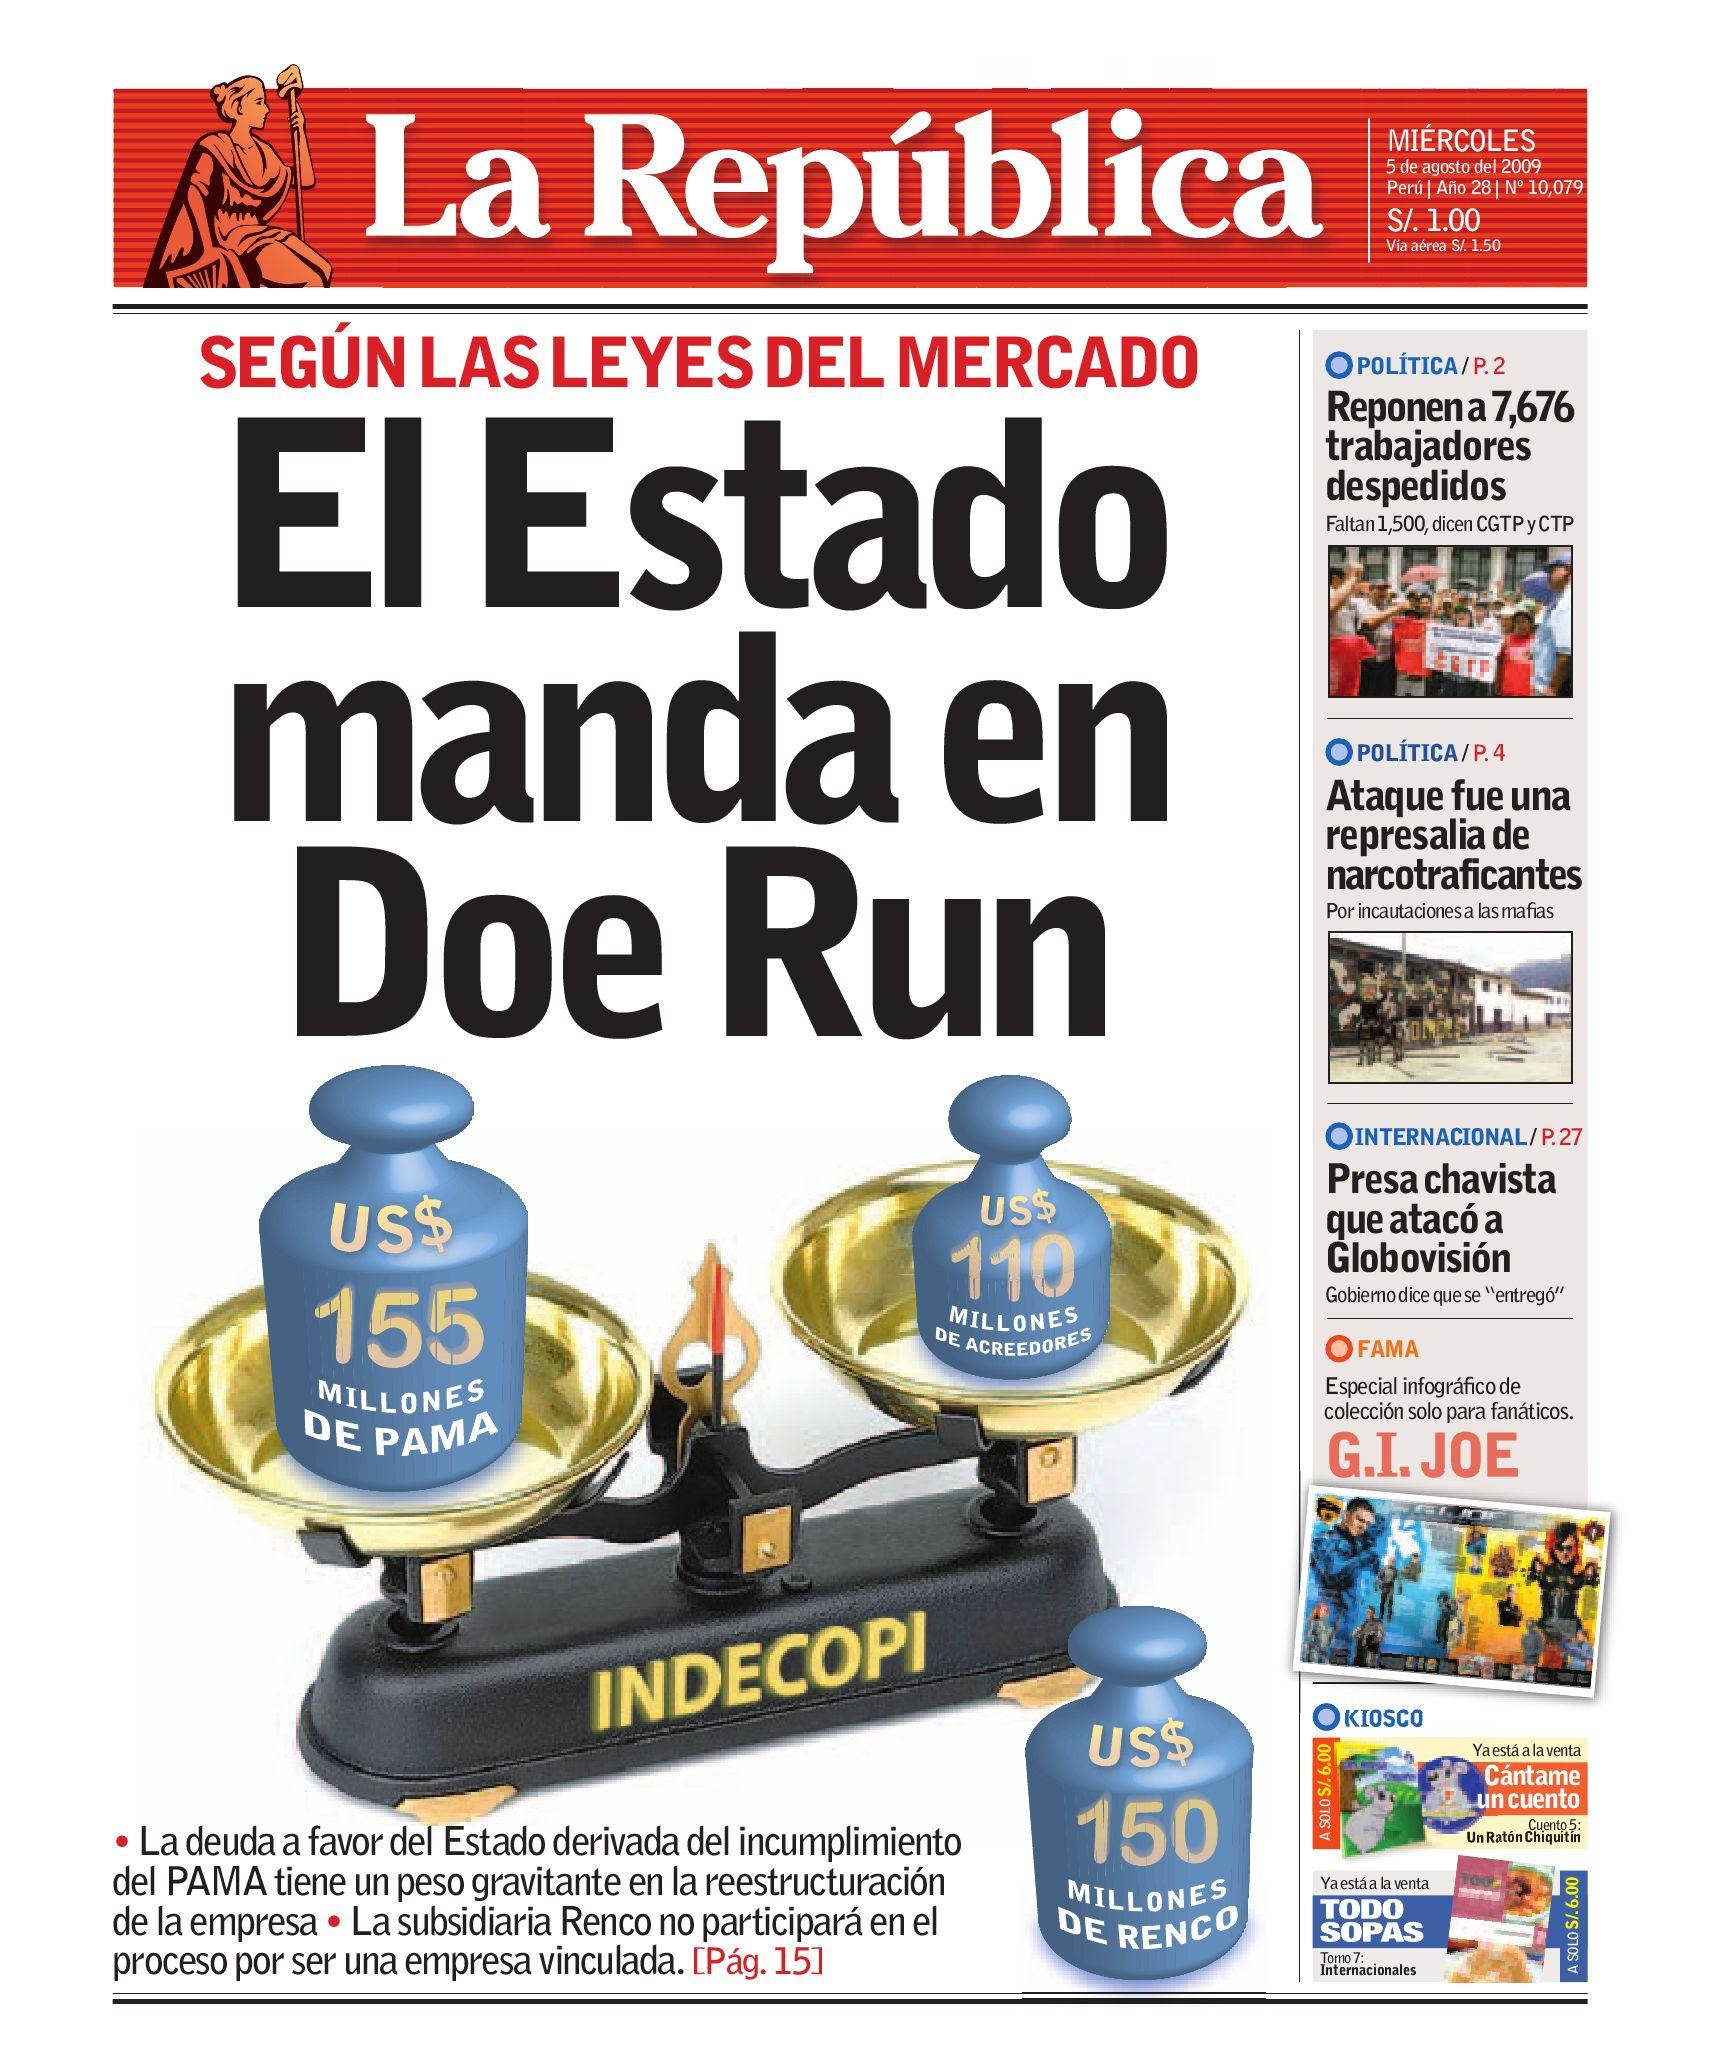 republica_lima_050809.pdf by Grupo La República Publicaciones - issuu